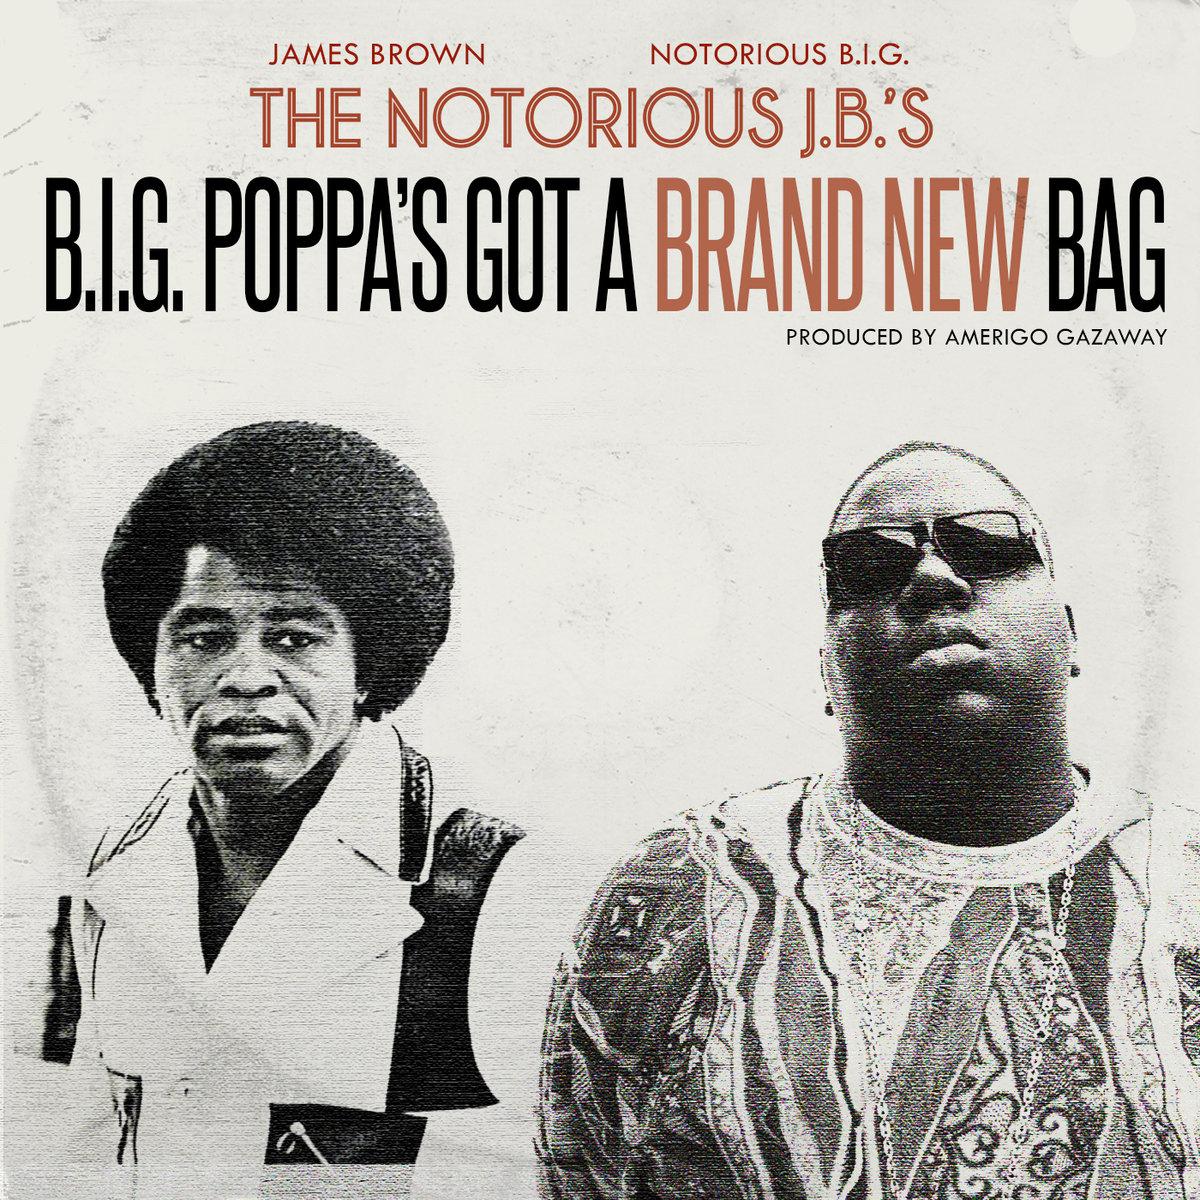 Amerigo Gazaway is back at it again: listen to 10 The Notorious J.B.'s tracks